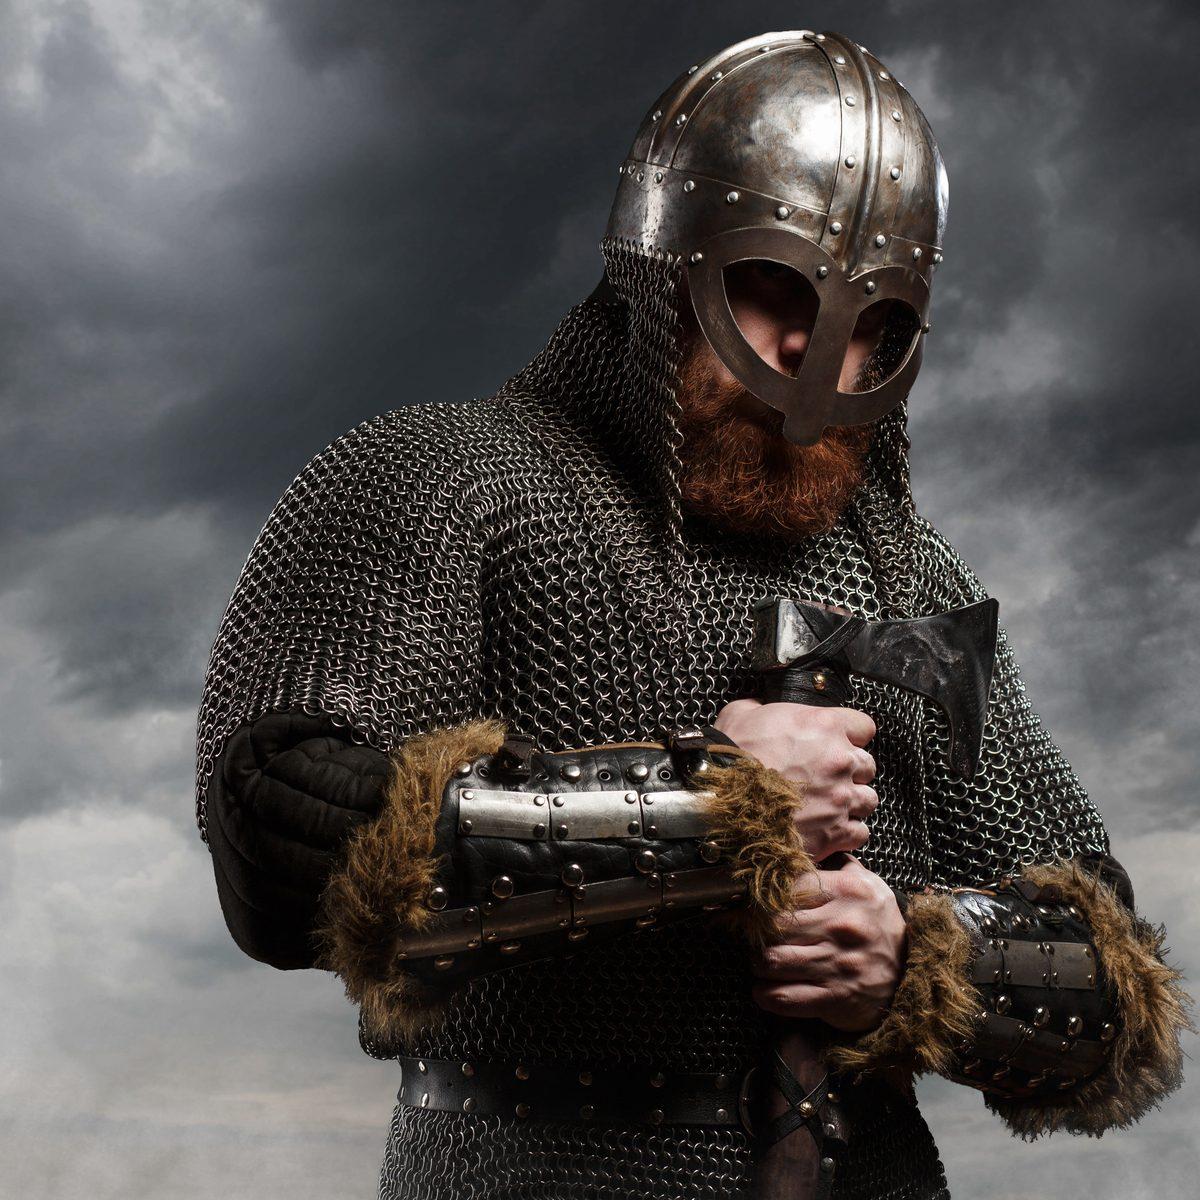 viking travels, cannabis seeds, bog, trade, natives, newfoundland, canada